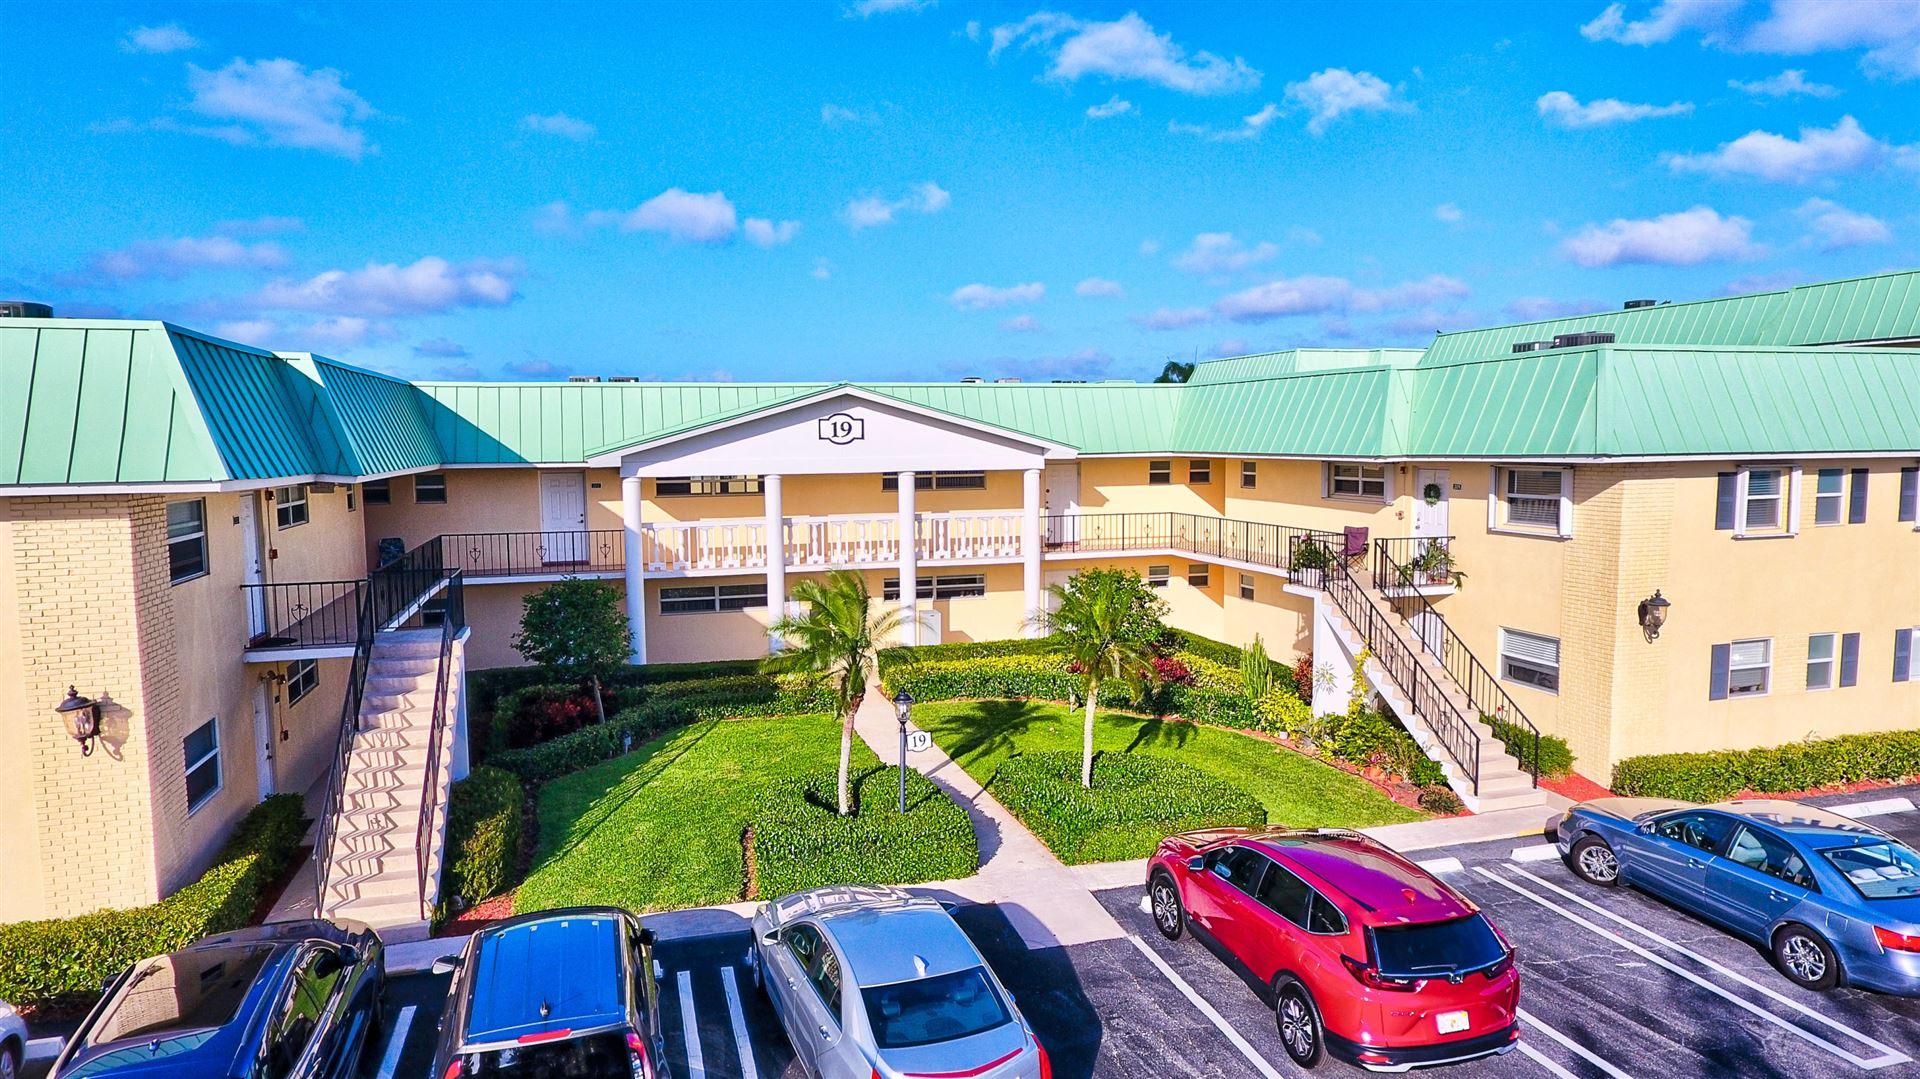 19 Colonial Club Drive #201, Boynton Beach, FL 33435 - #: RX-10694750